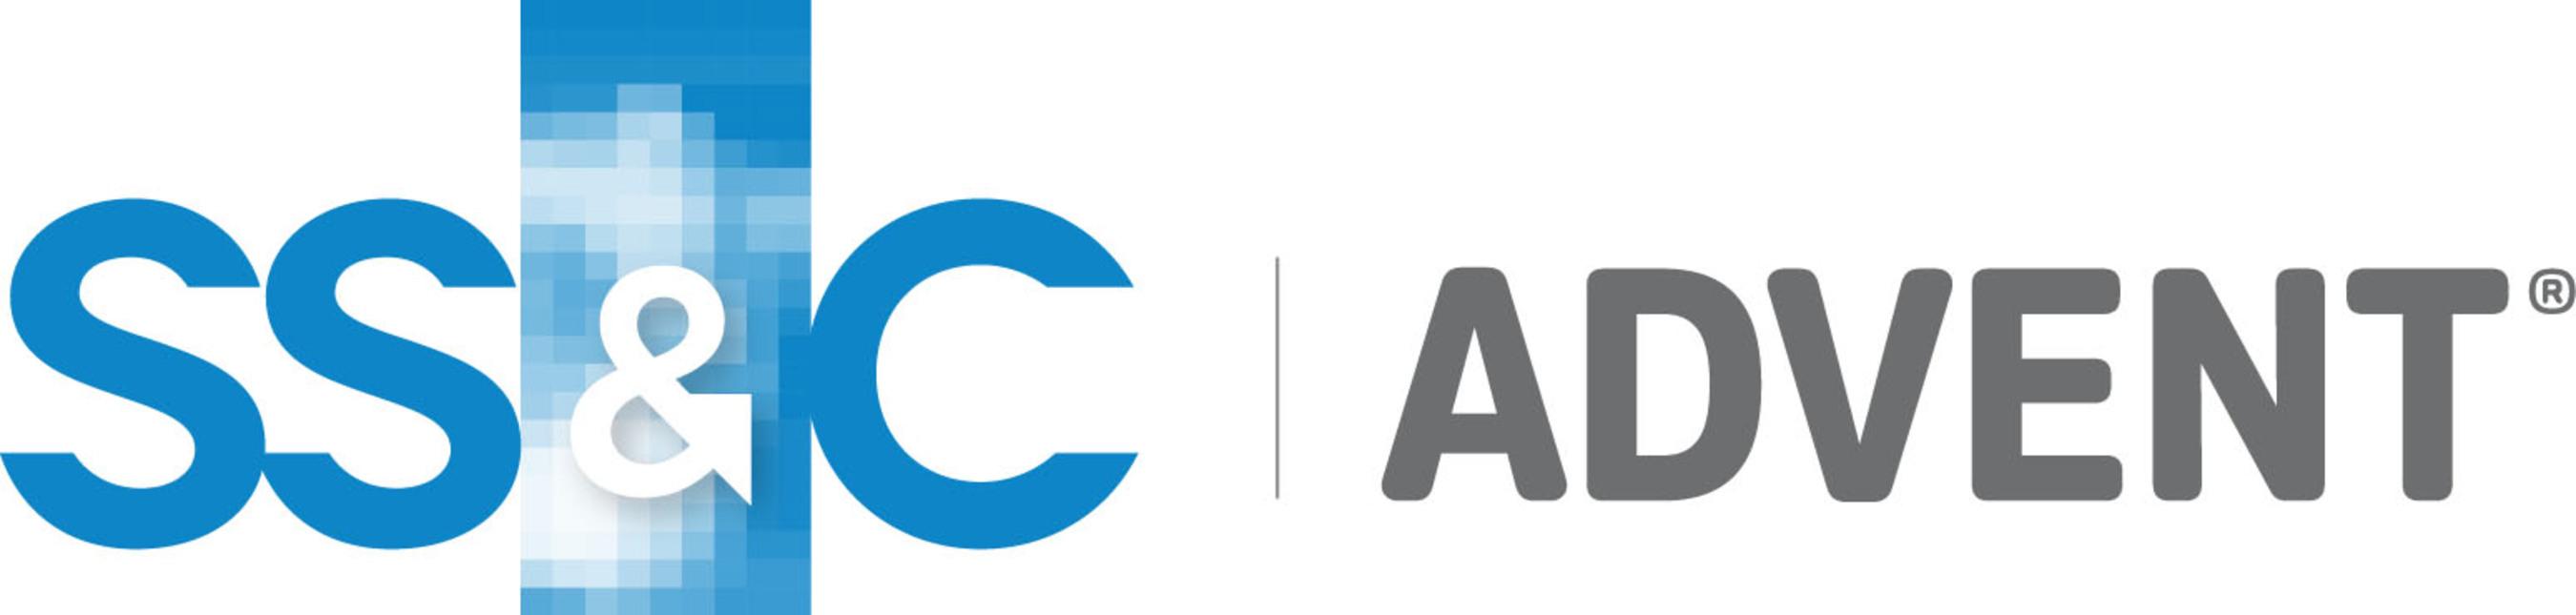 SSC Advent logo